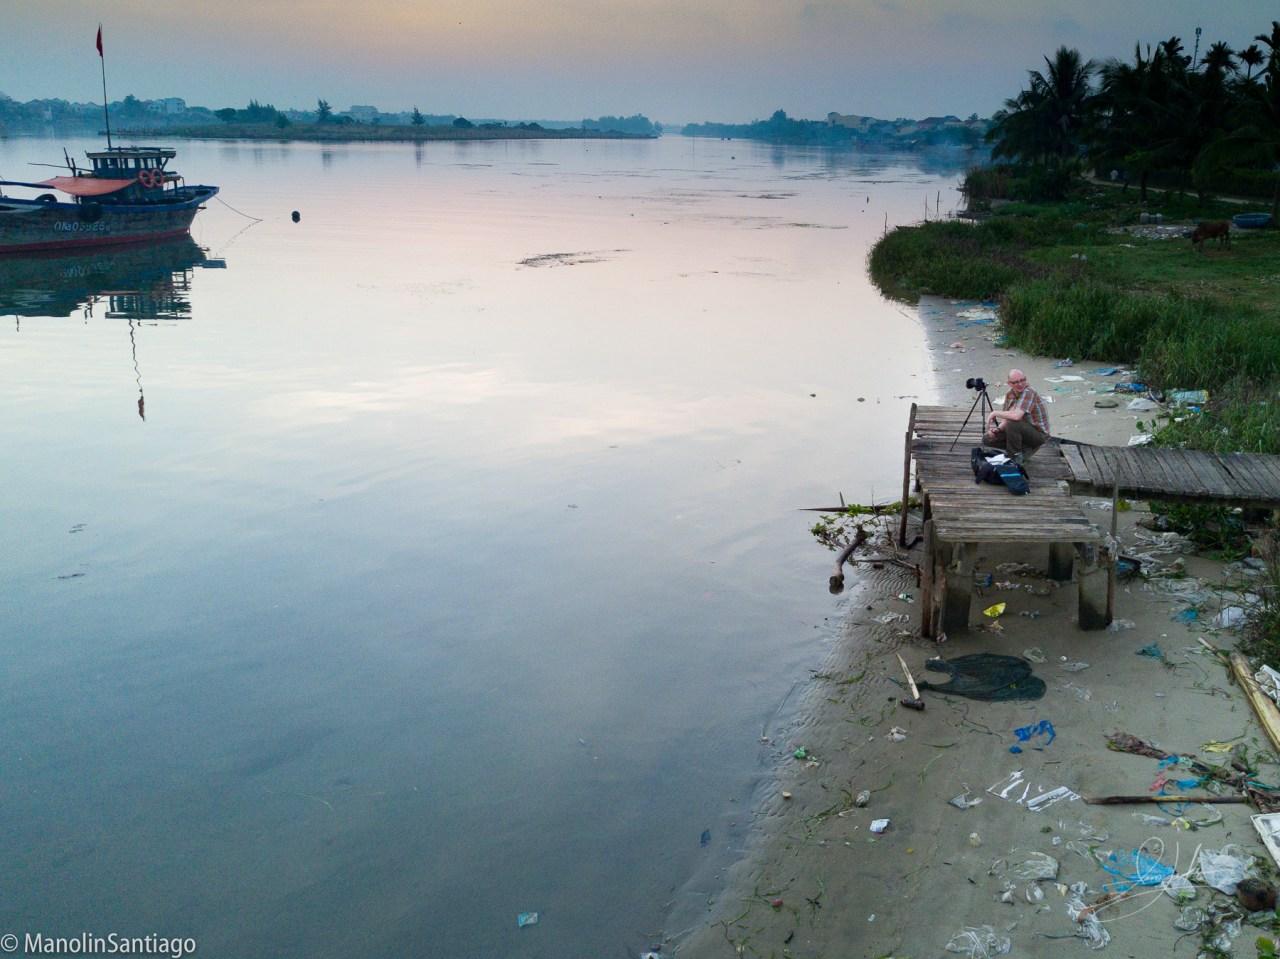 Thu Bồn River in Hội An, Vietnam